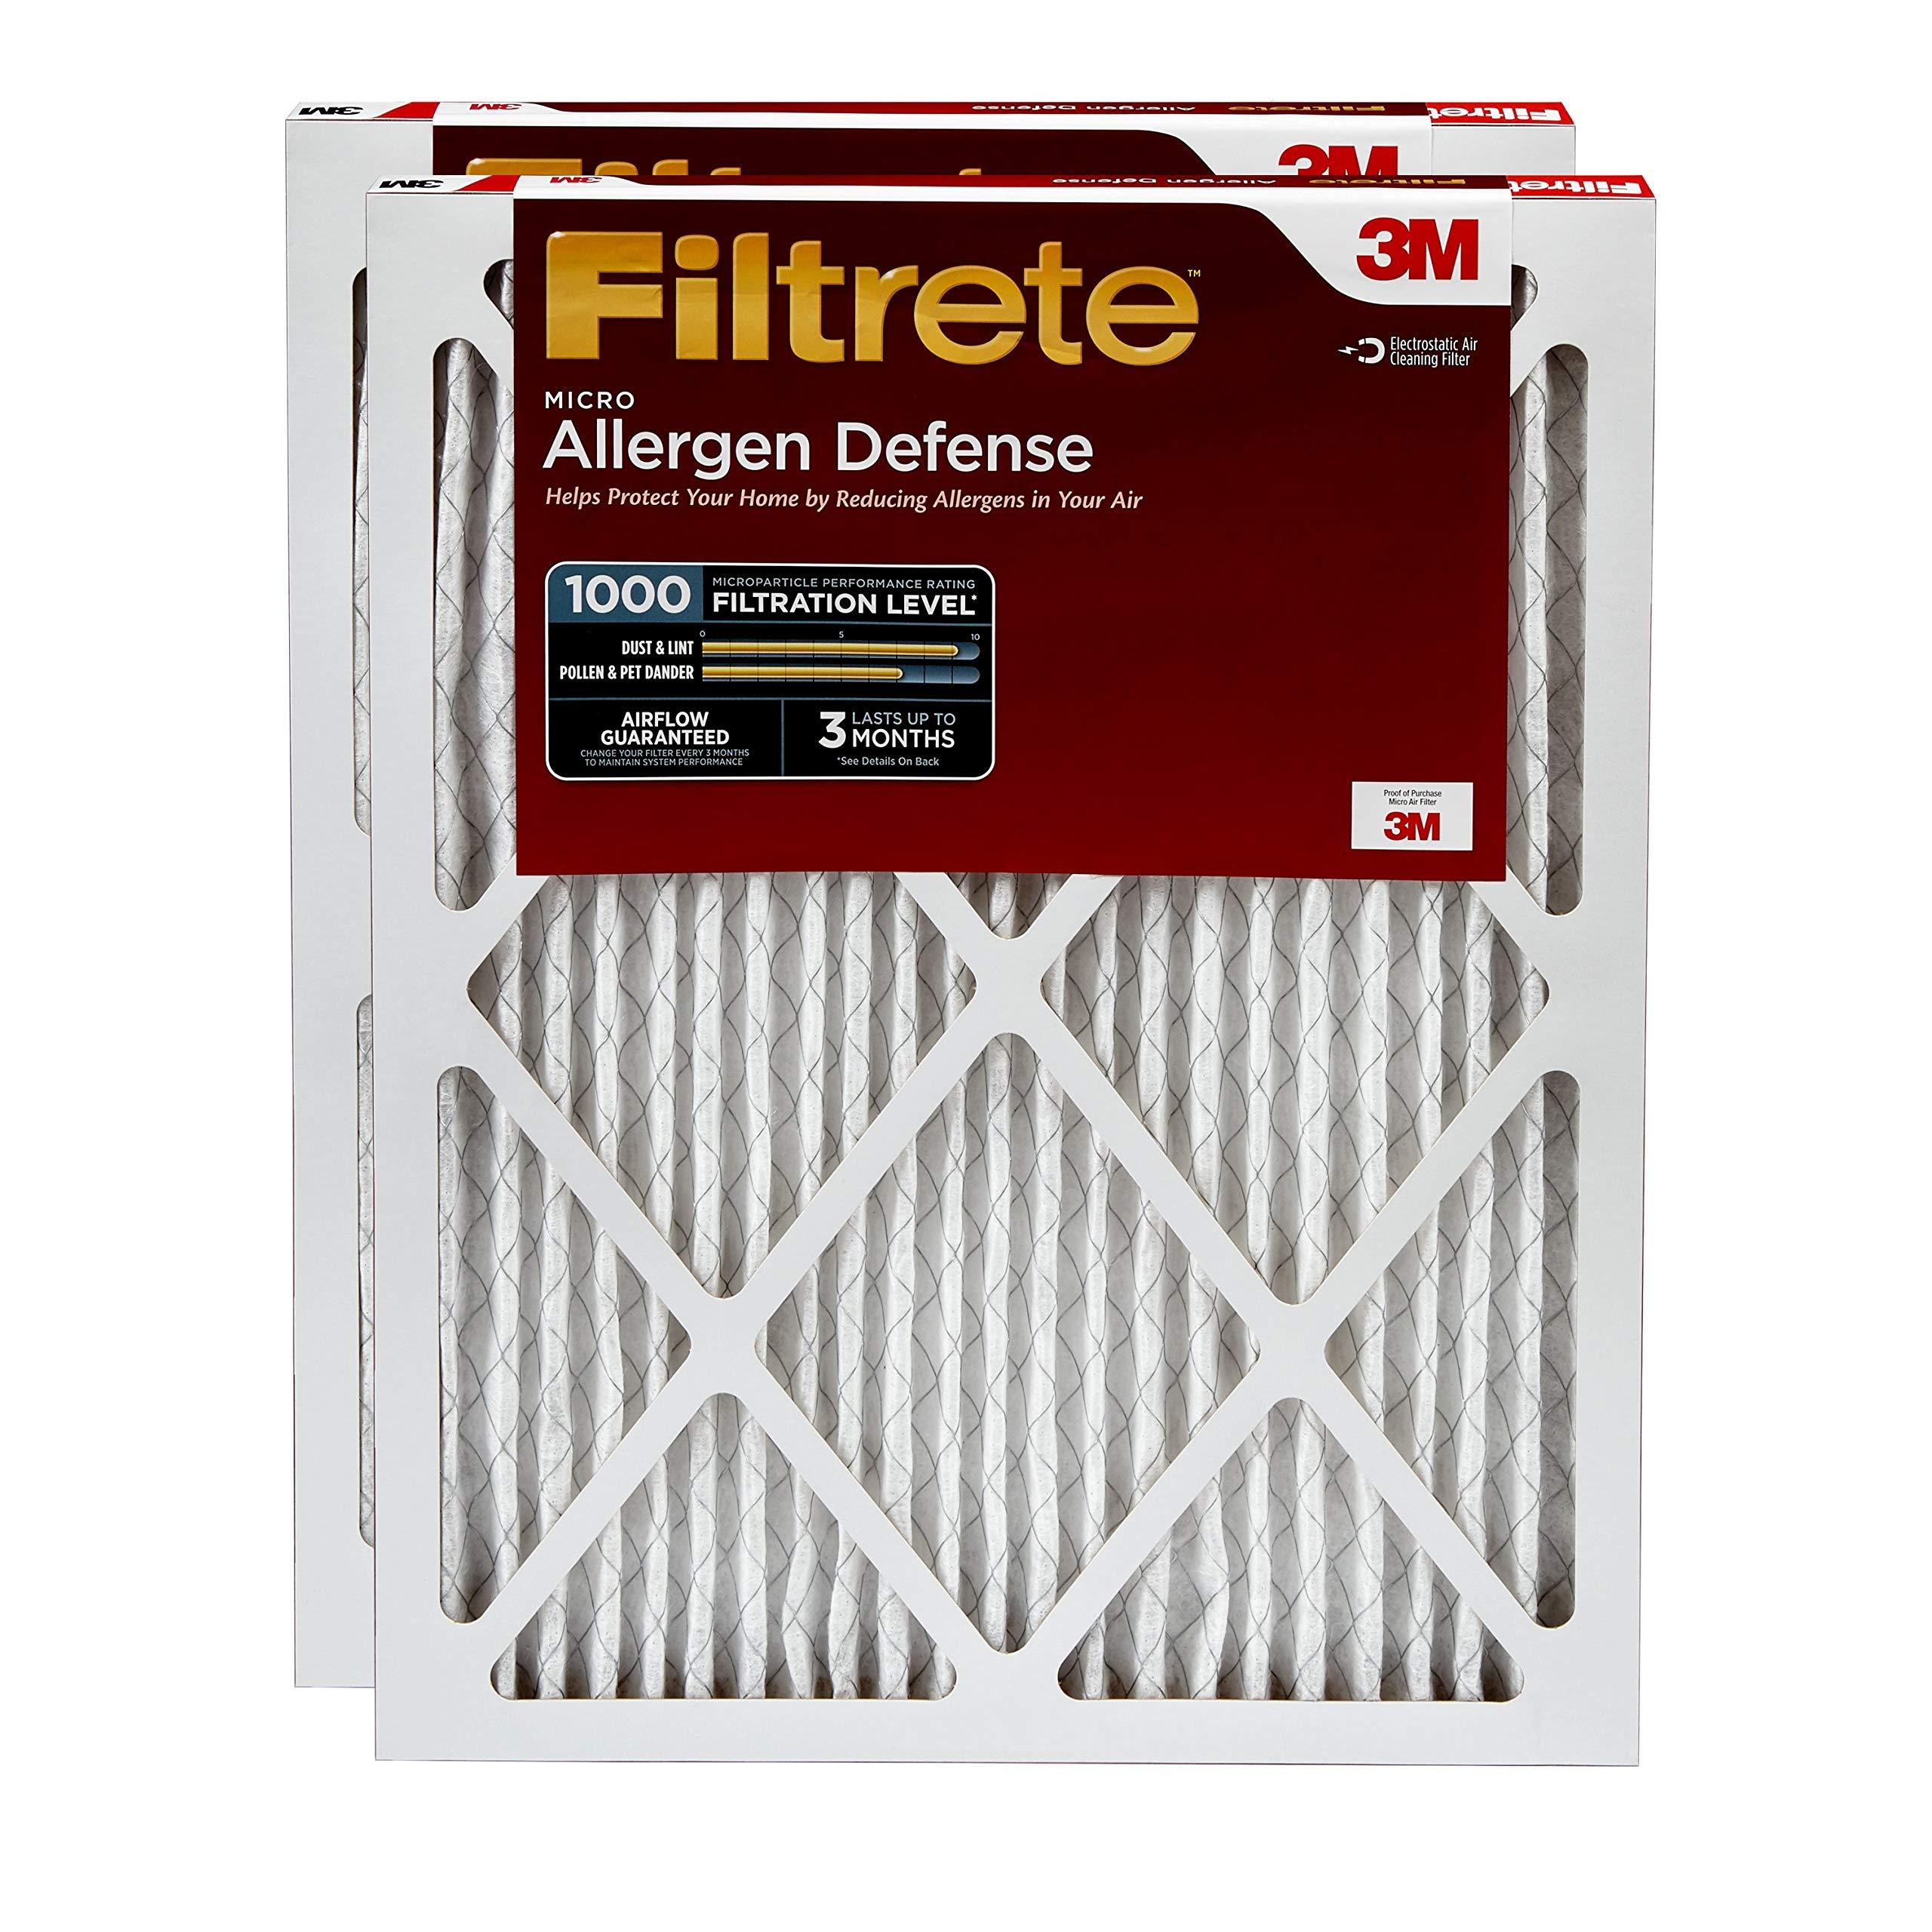 Filtrete 16x25x1, AC Furnace Air Filter, MPR 1000, Micro Allergen Defense, 2-Pack by Filtrete